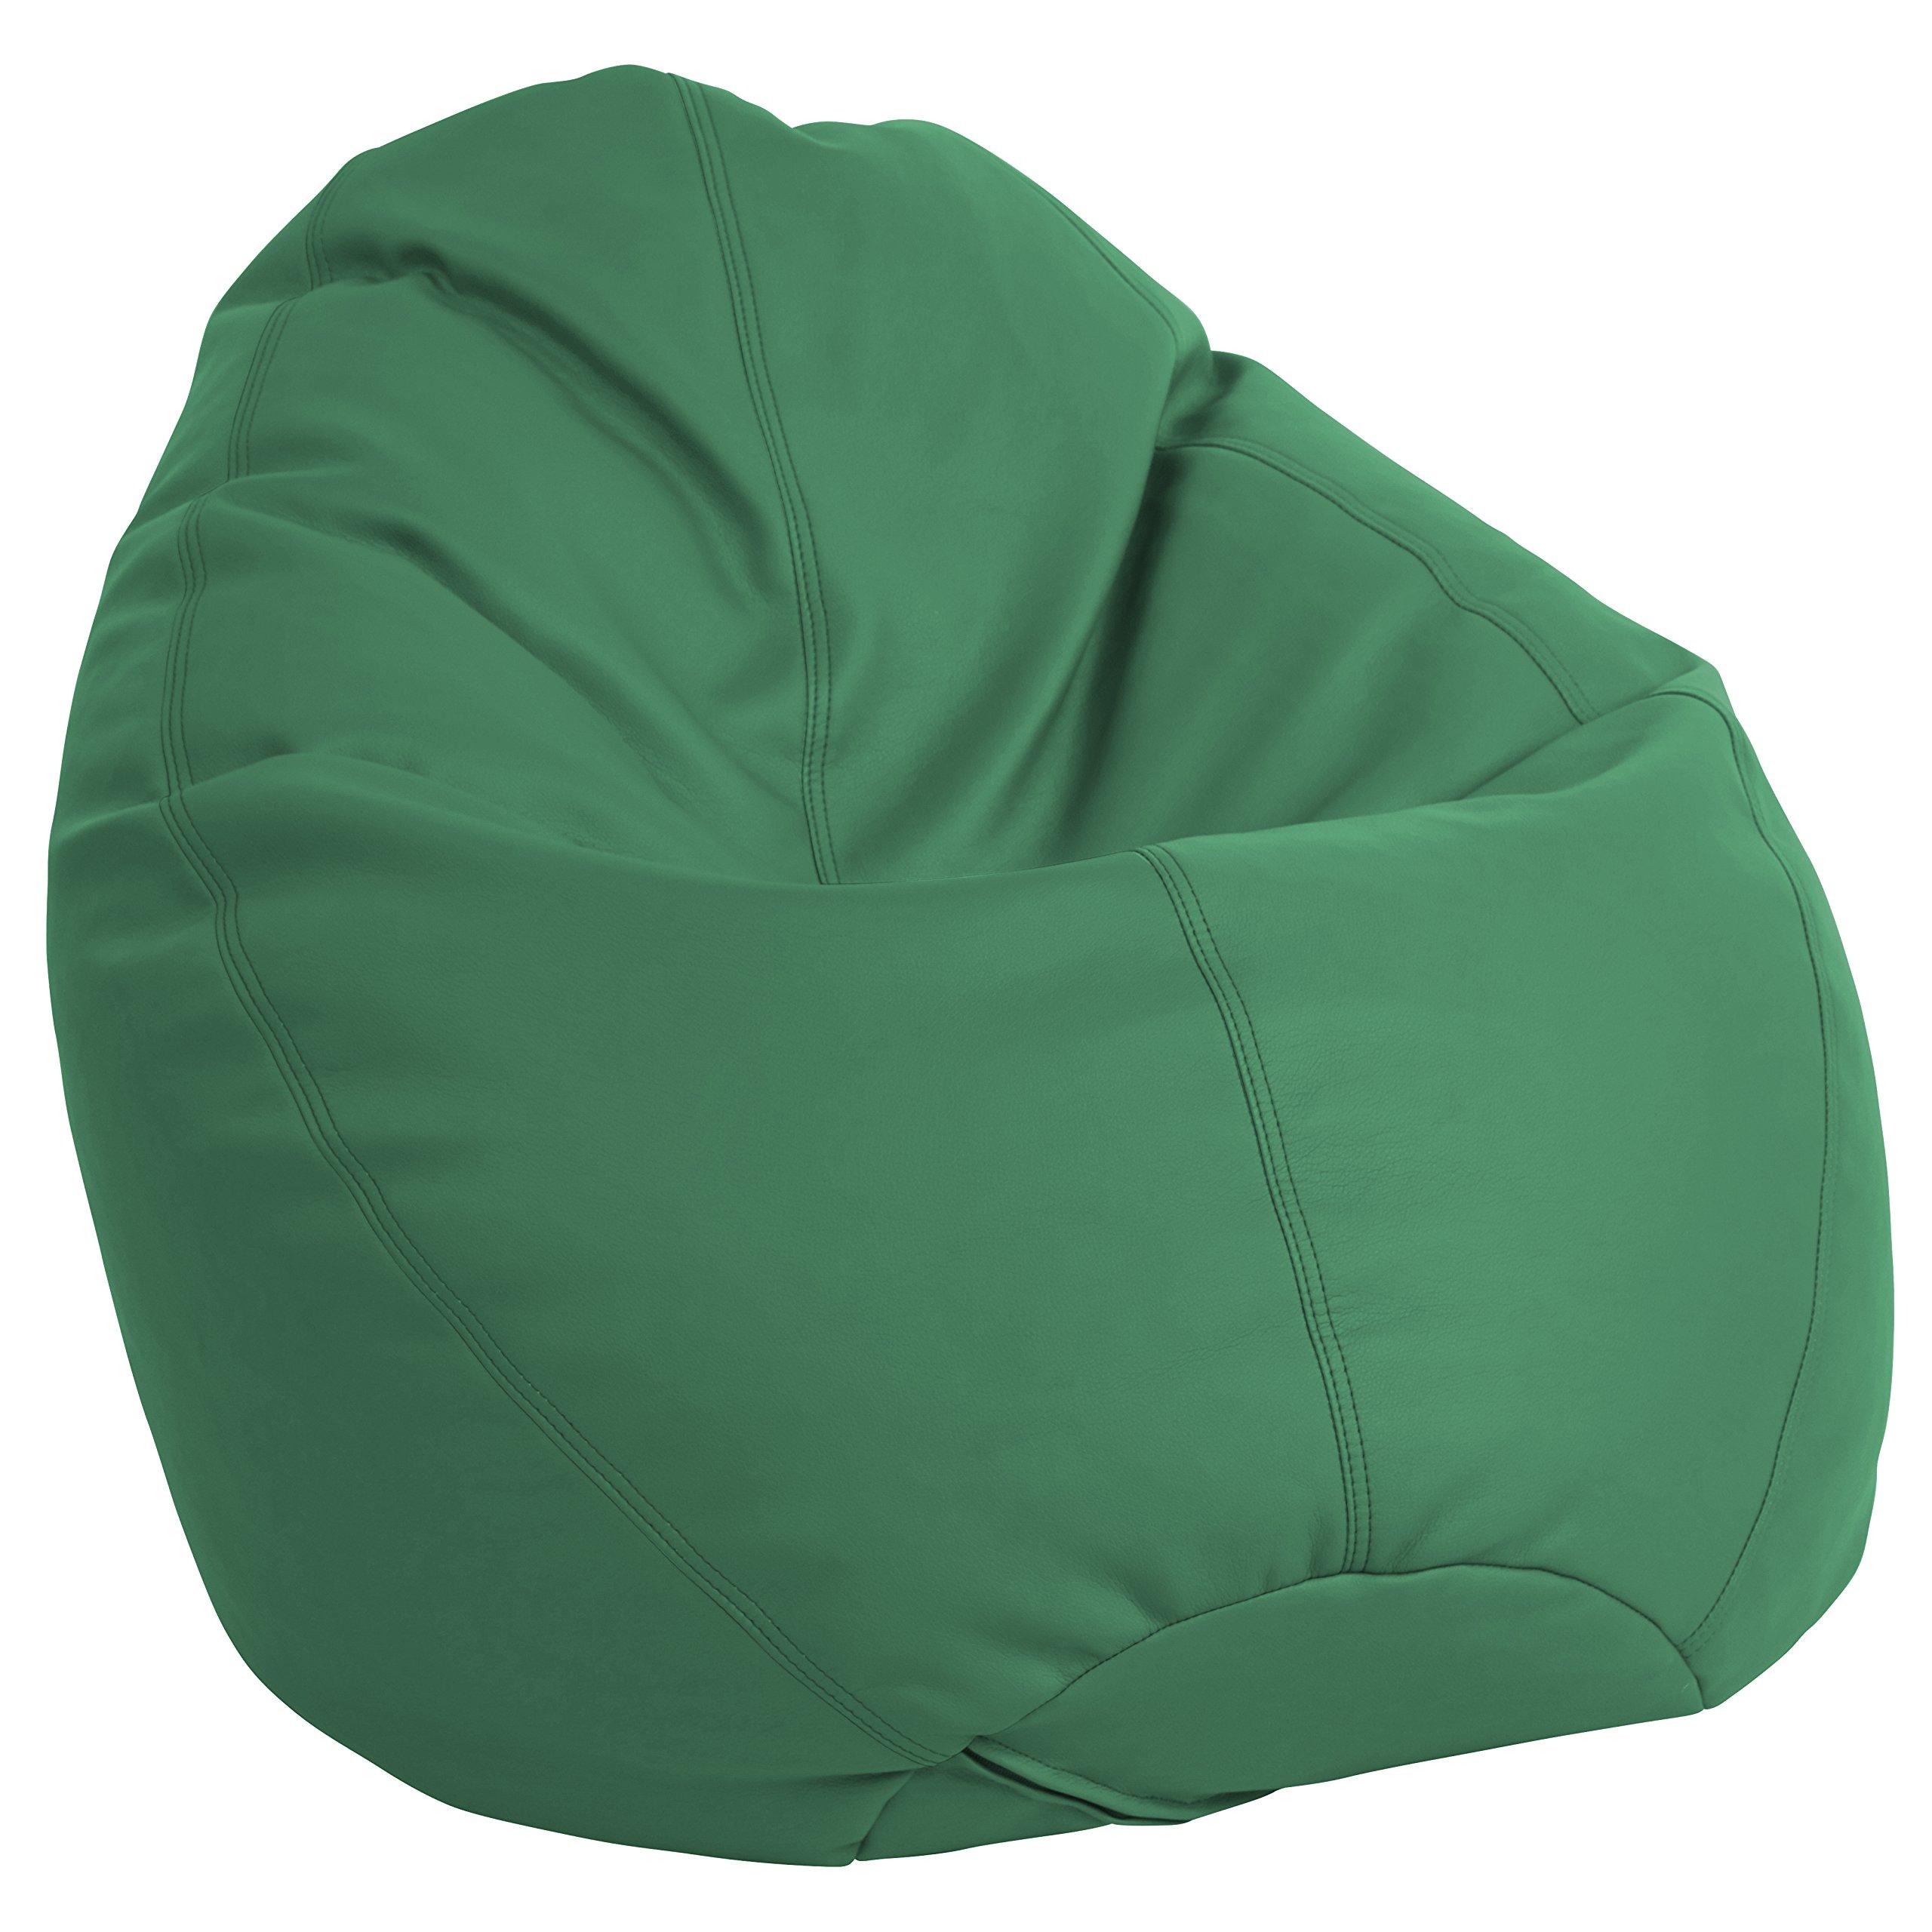 ECR4Kids Dew Drop Bean Bag Chair, Green